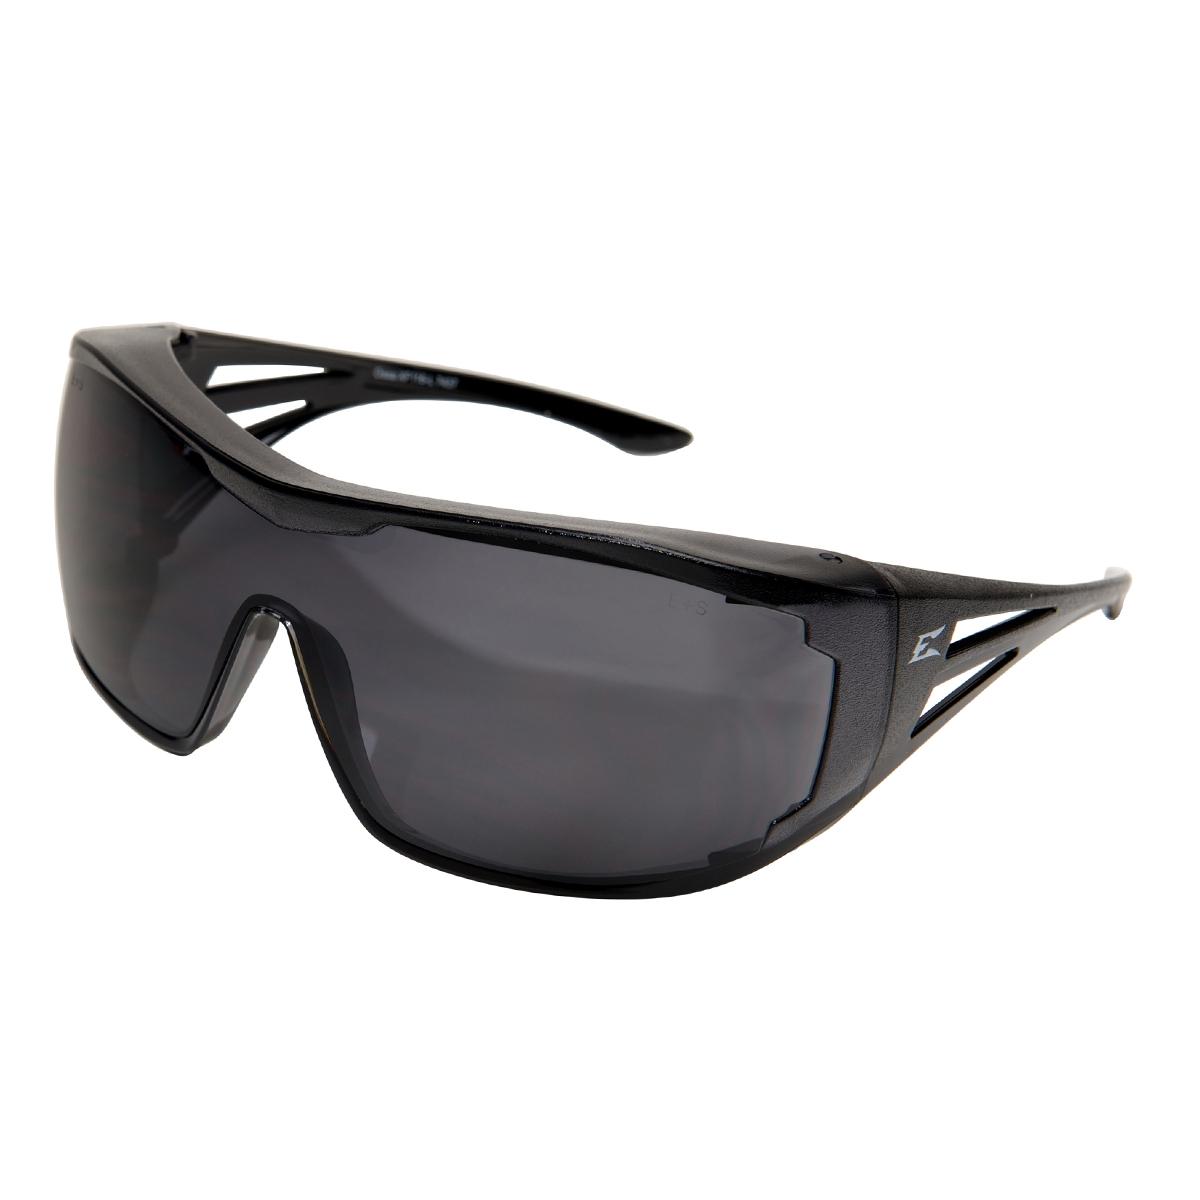 Edge Prescription Safety Glasses